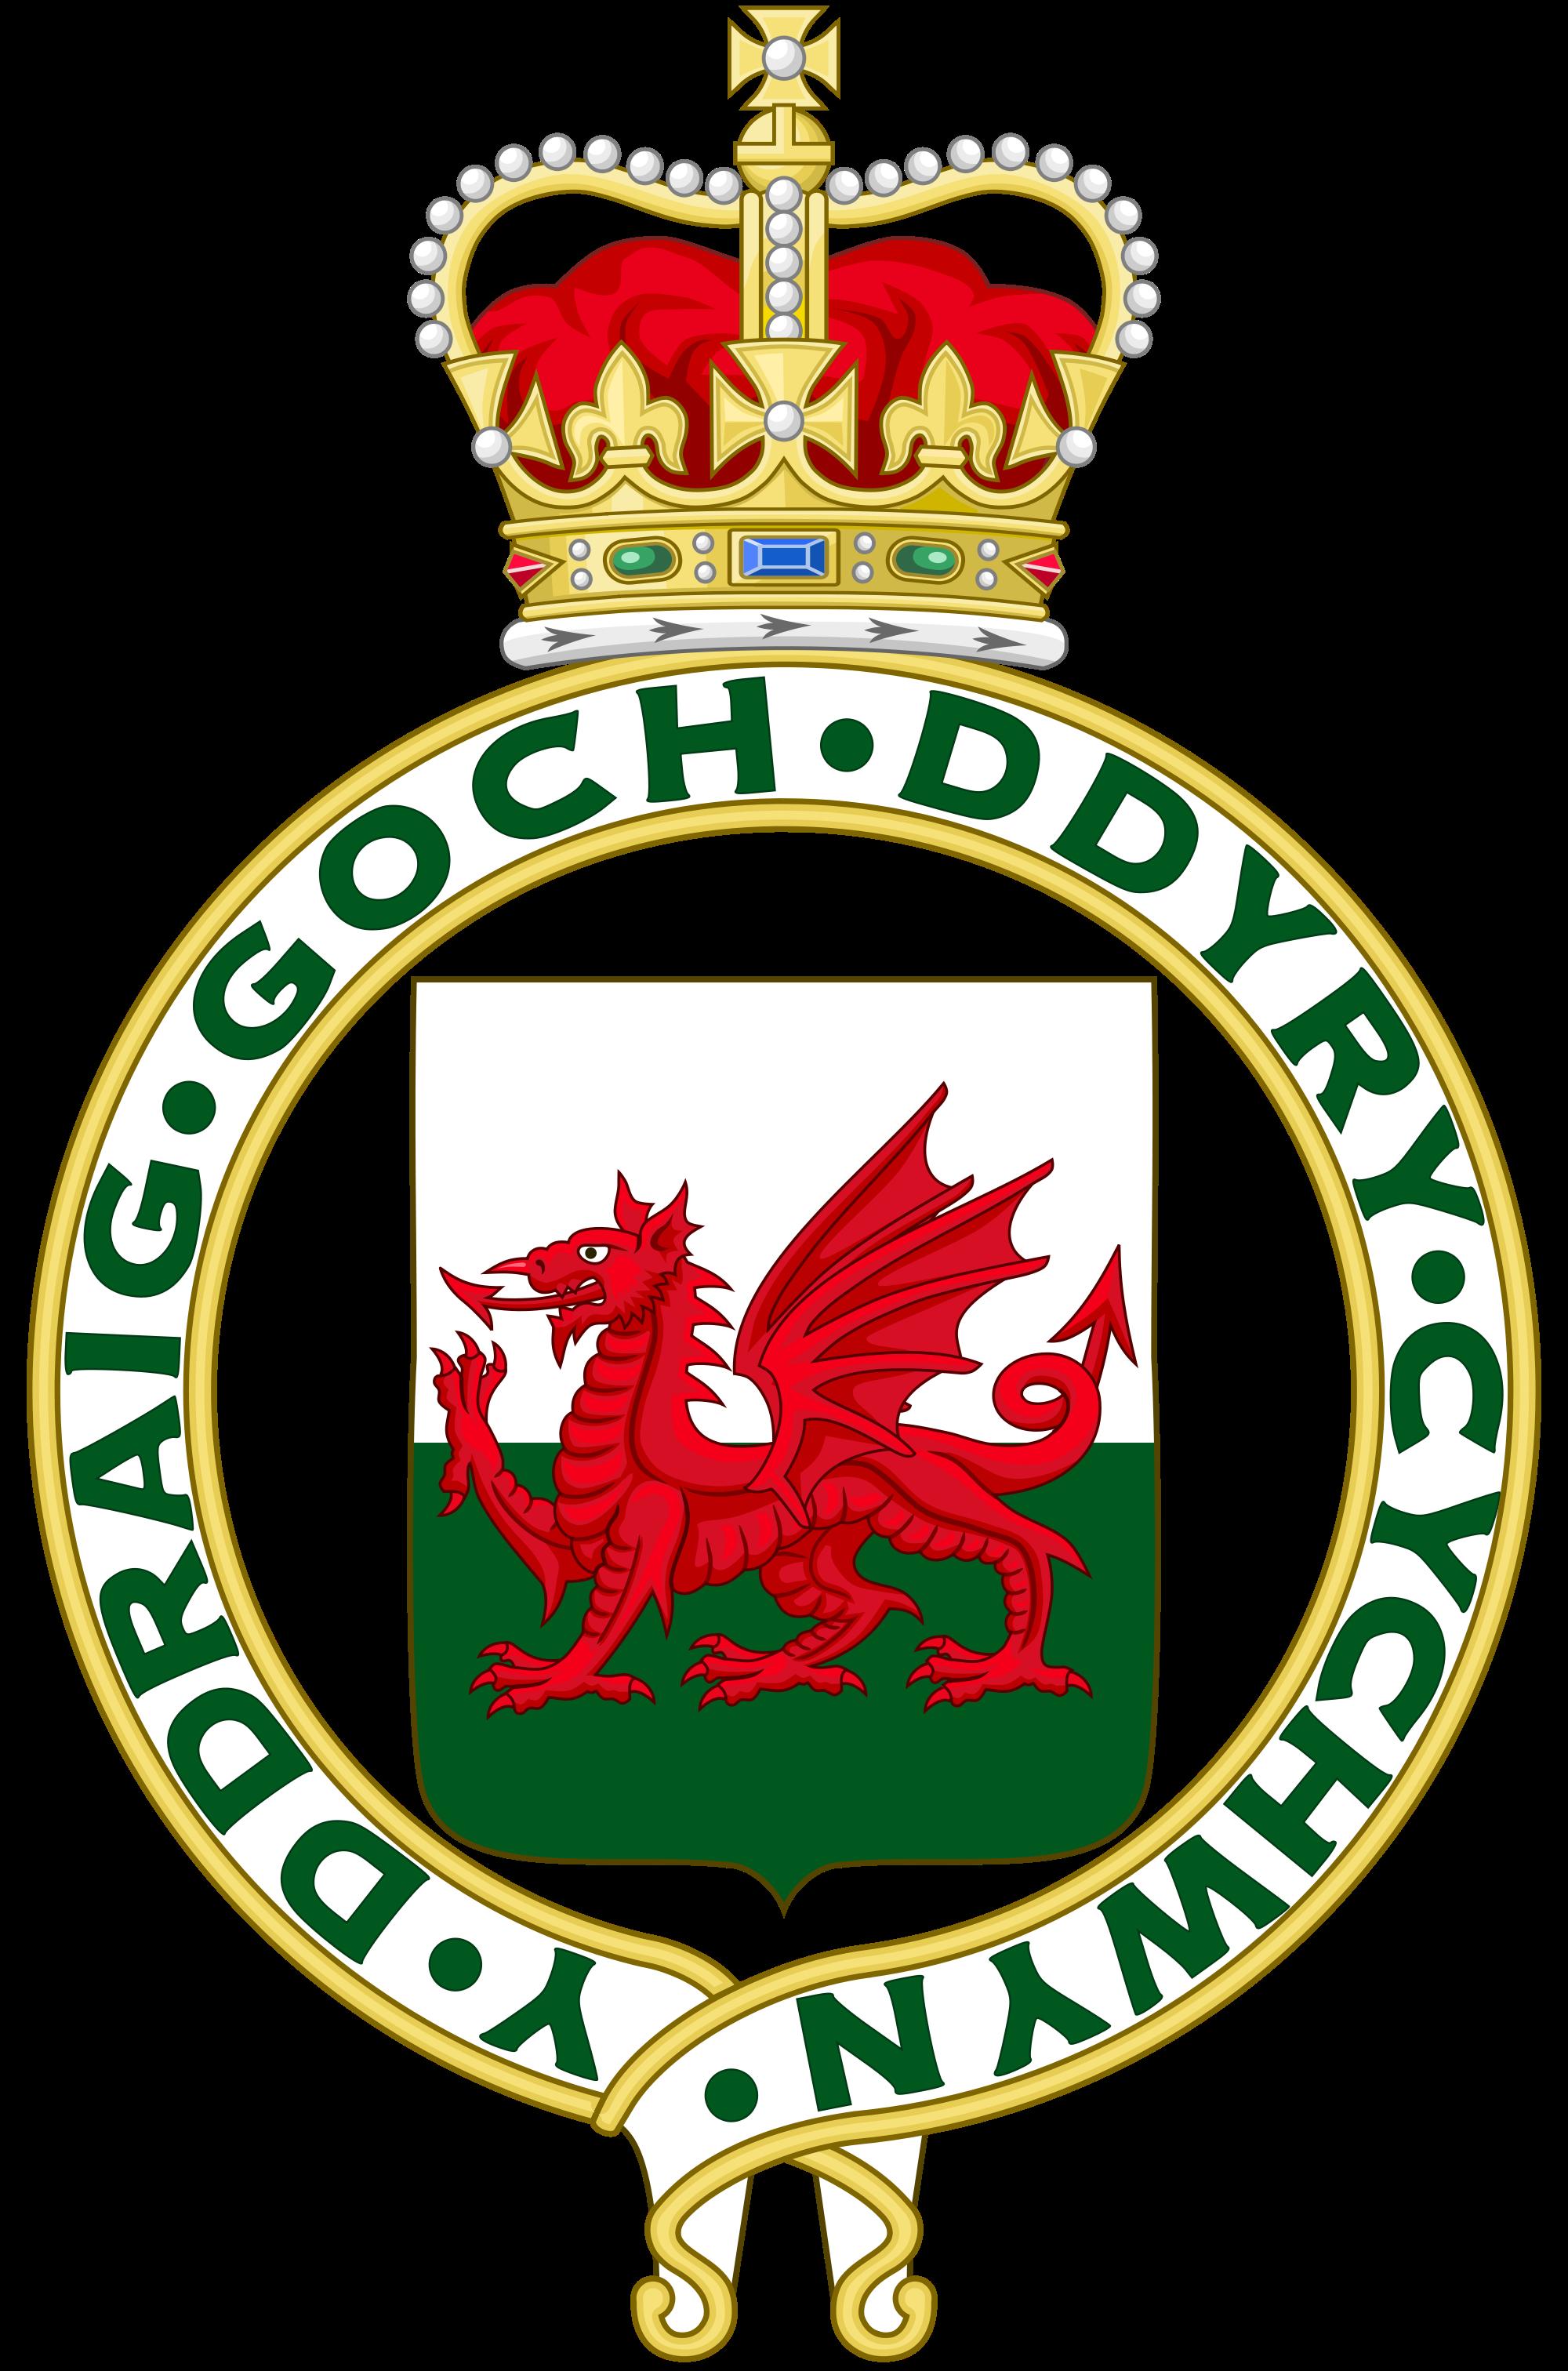 Royal badge of wales 1953 steme medalii embleme pinterest royal badge of wales 1953 buycottarizona